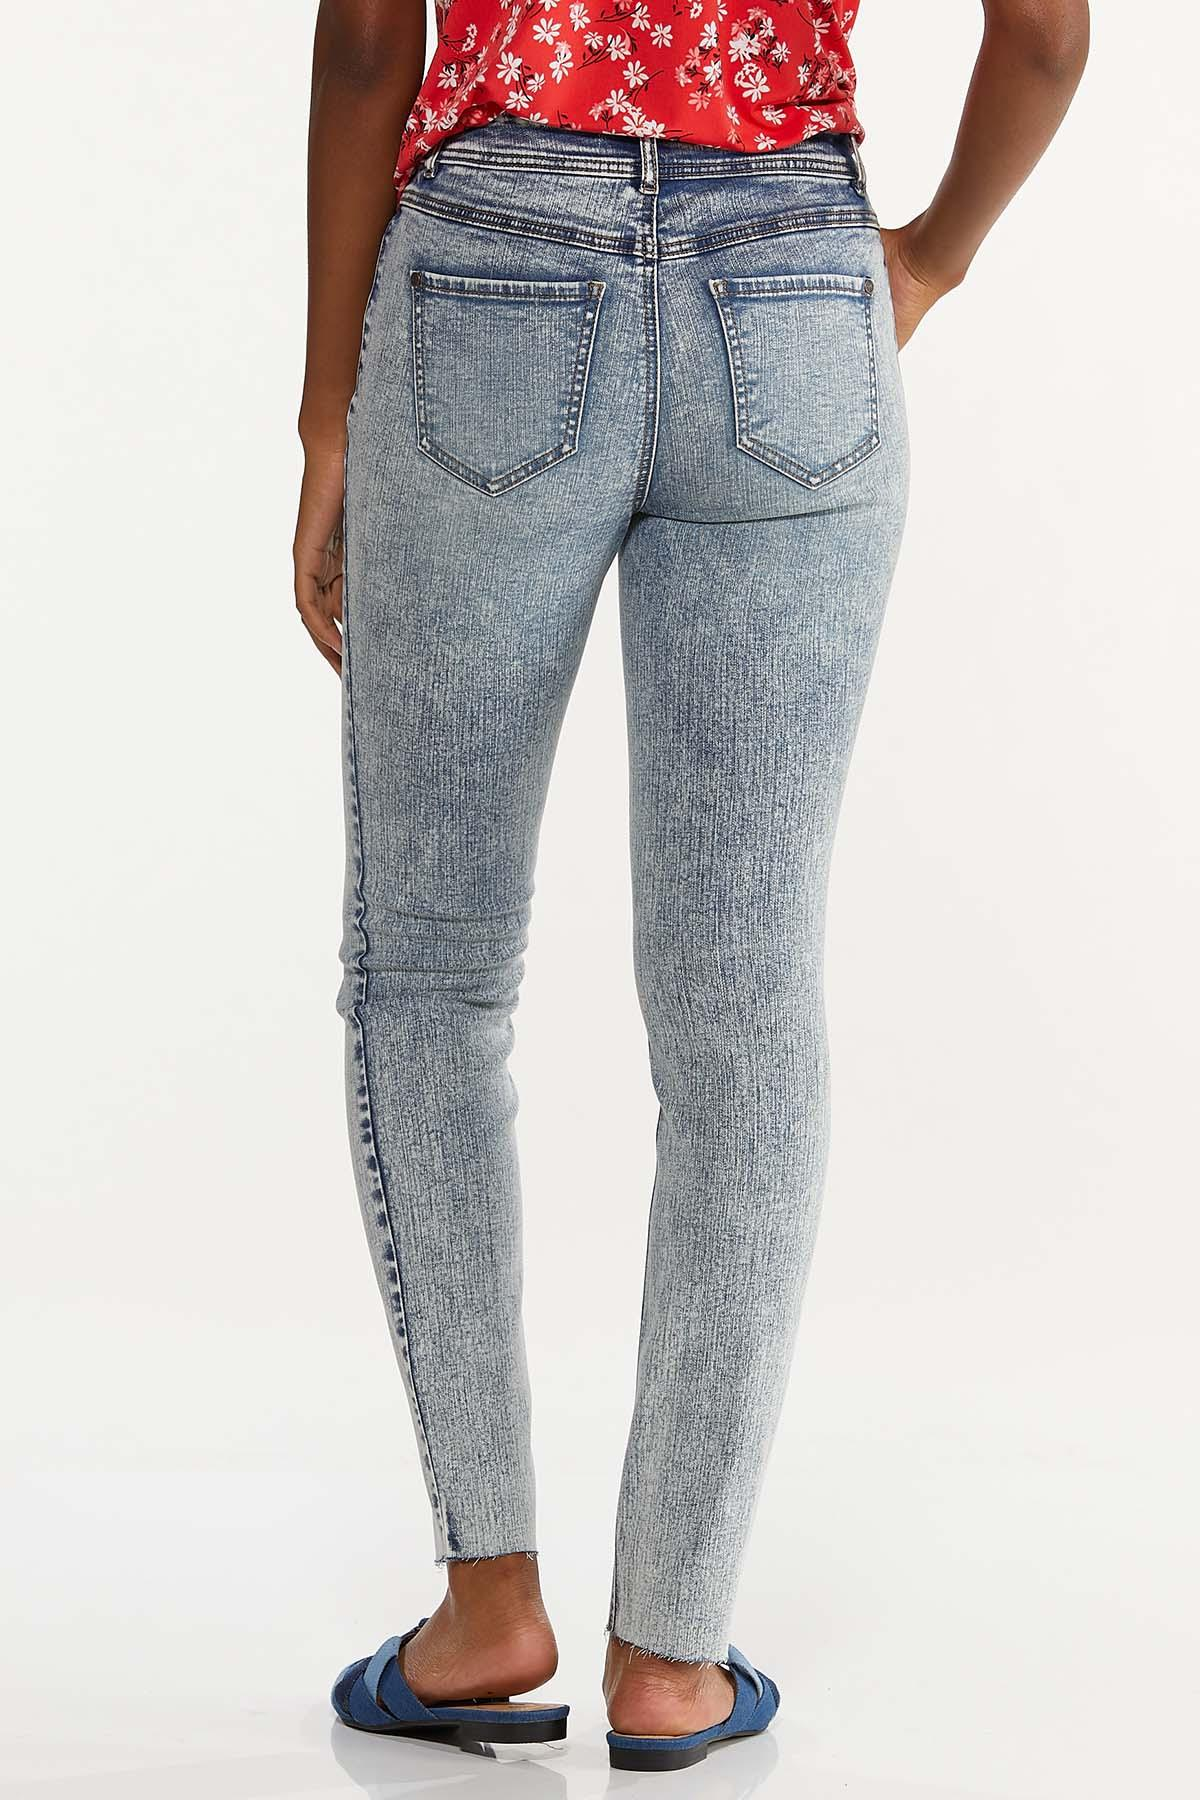 Acid Wash Skinny Jeans (Item #44644890)